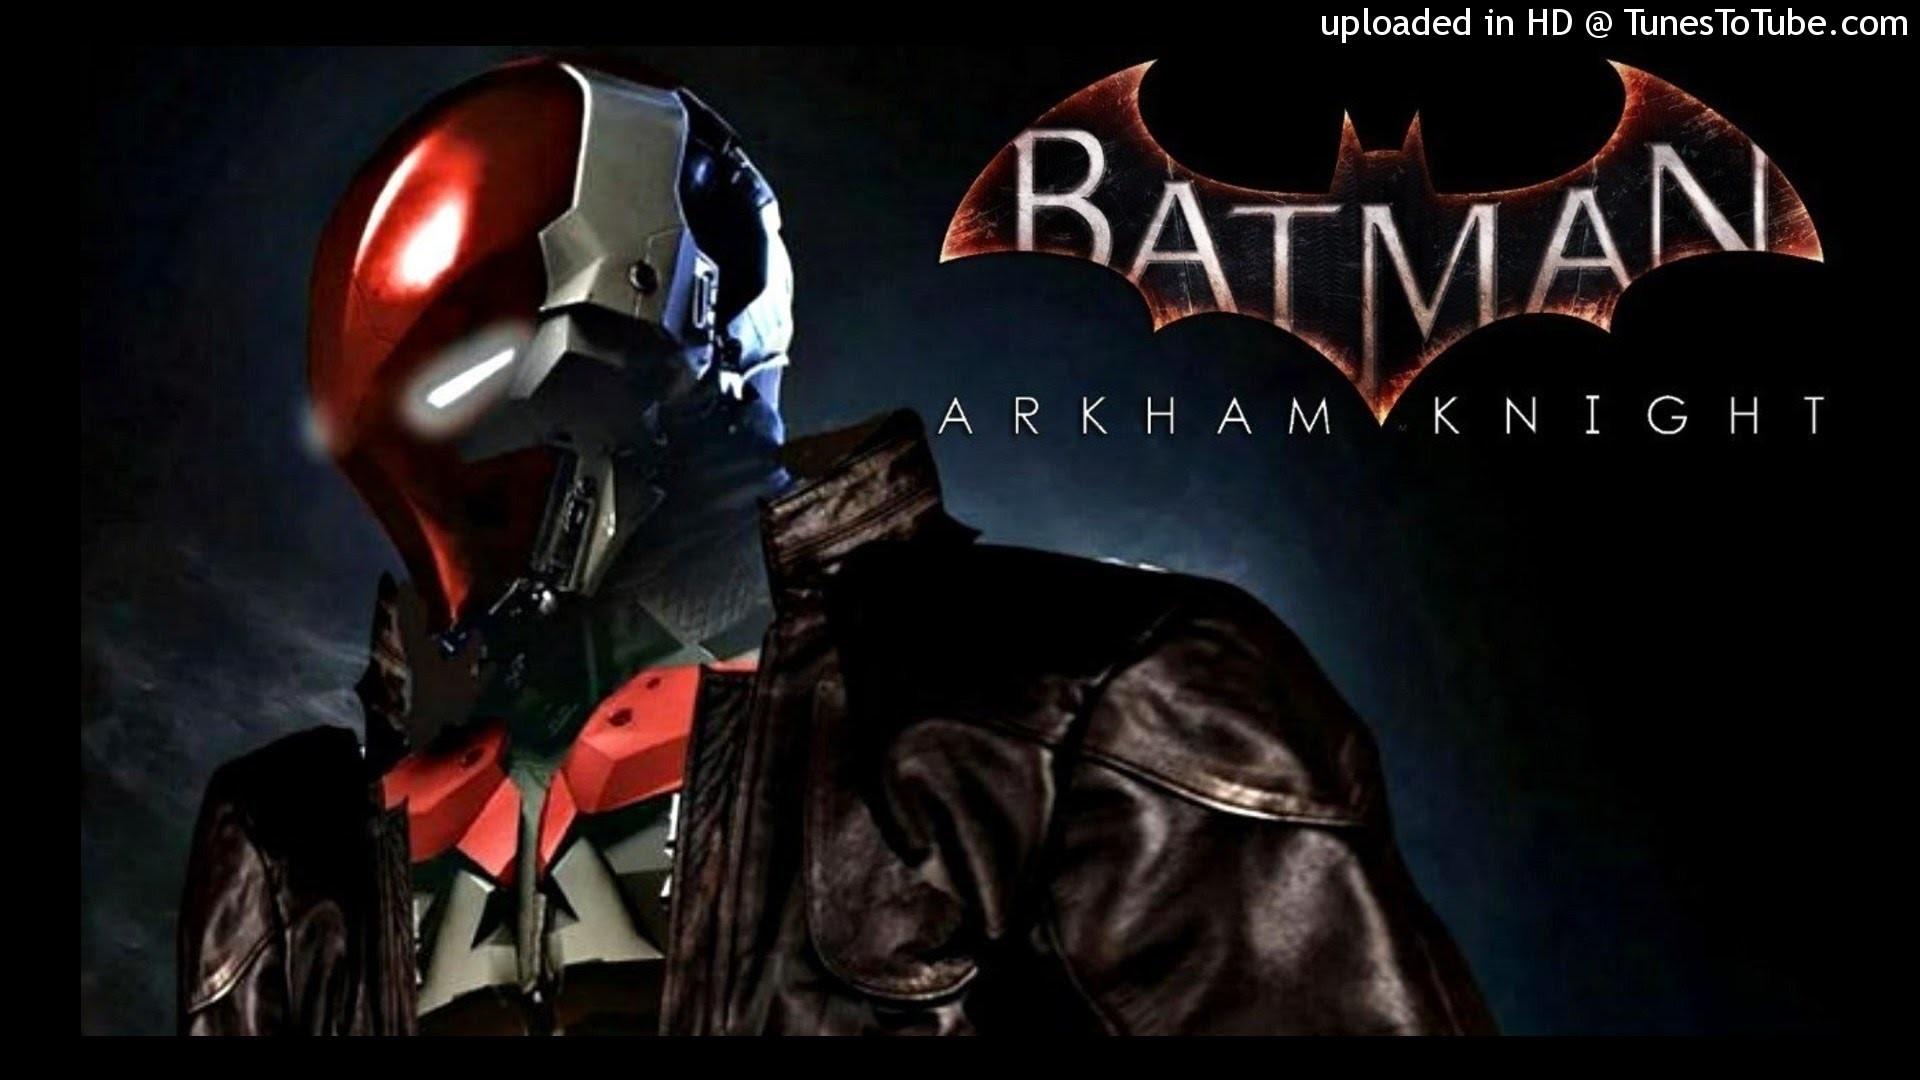 The Herald of Gotham – Prod. Dj Abomination (Batman Arkham Knight remix  instrumental) w/link – YouTube